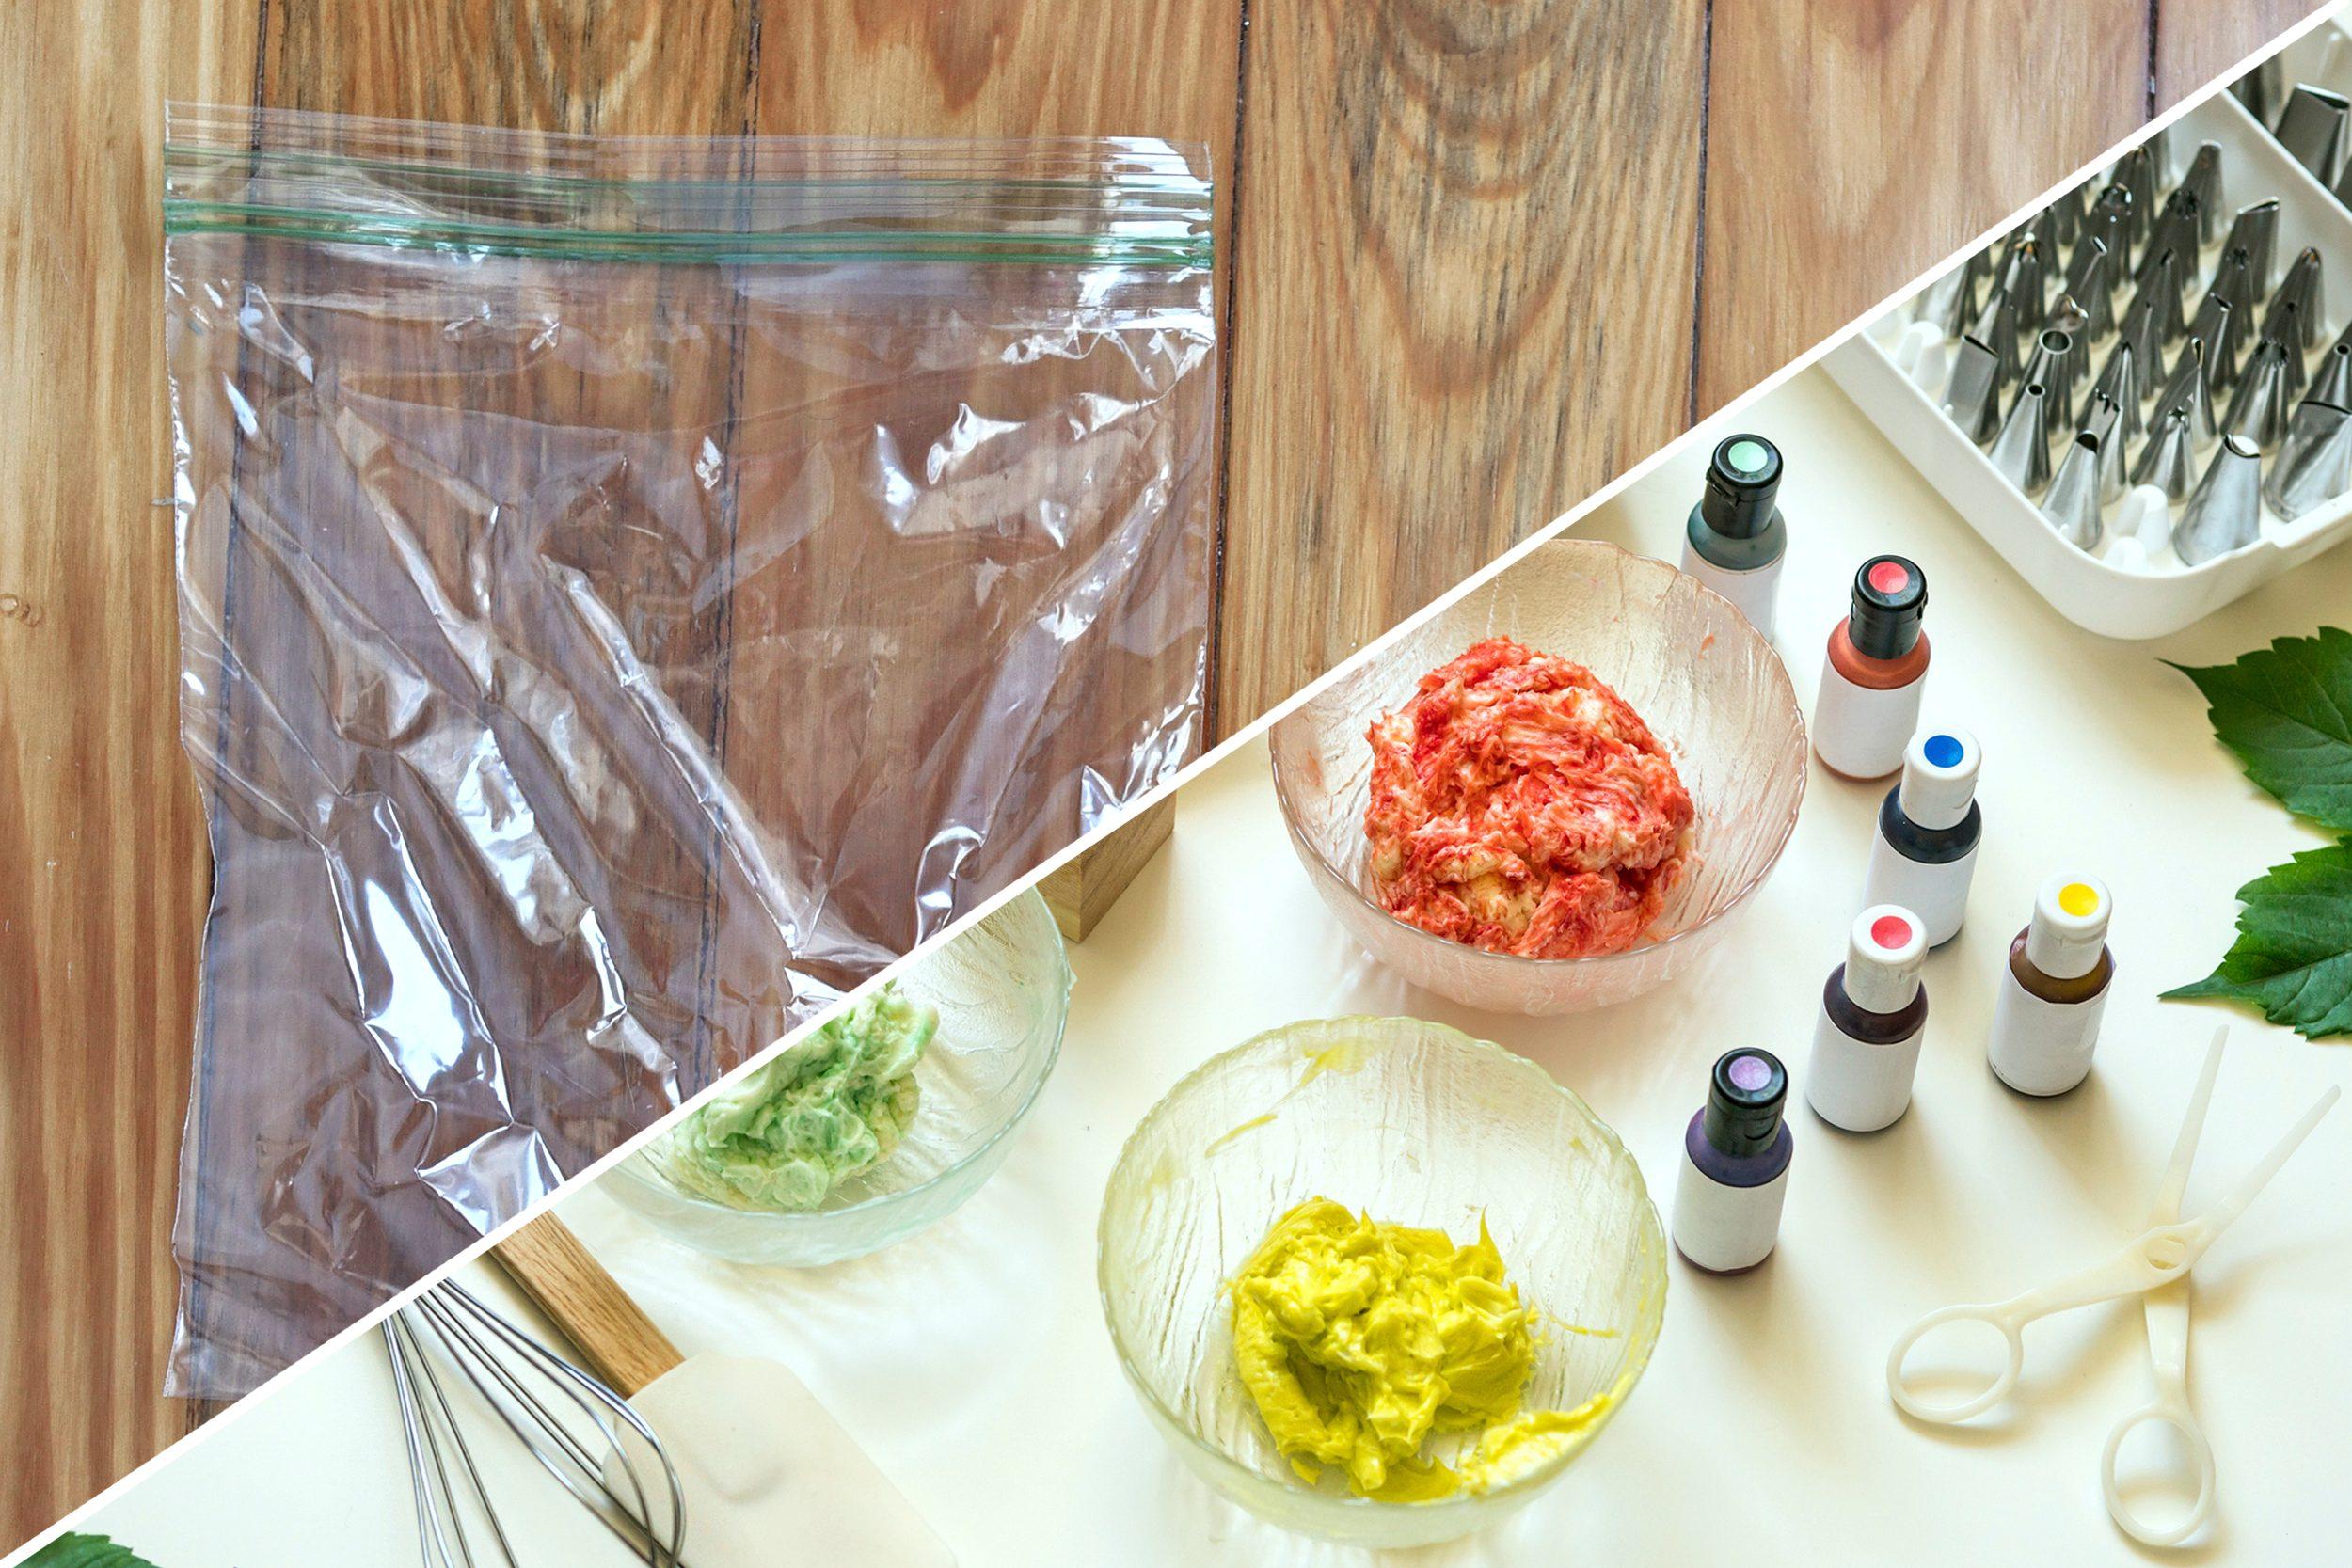 food coloring cookie dough plastic bag uses reusable life hacks